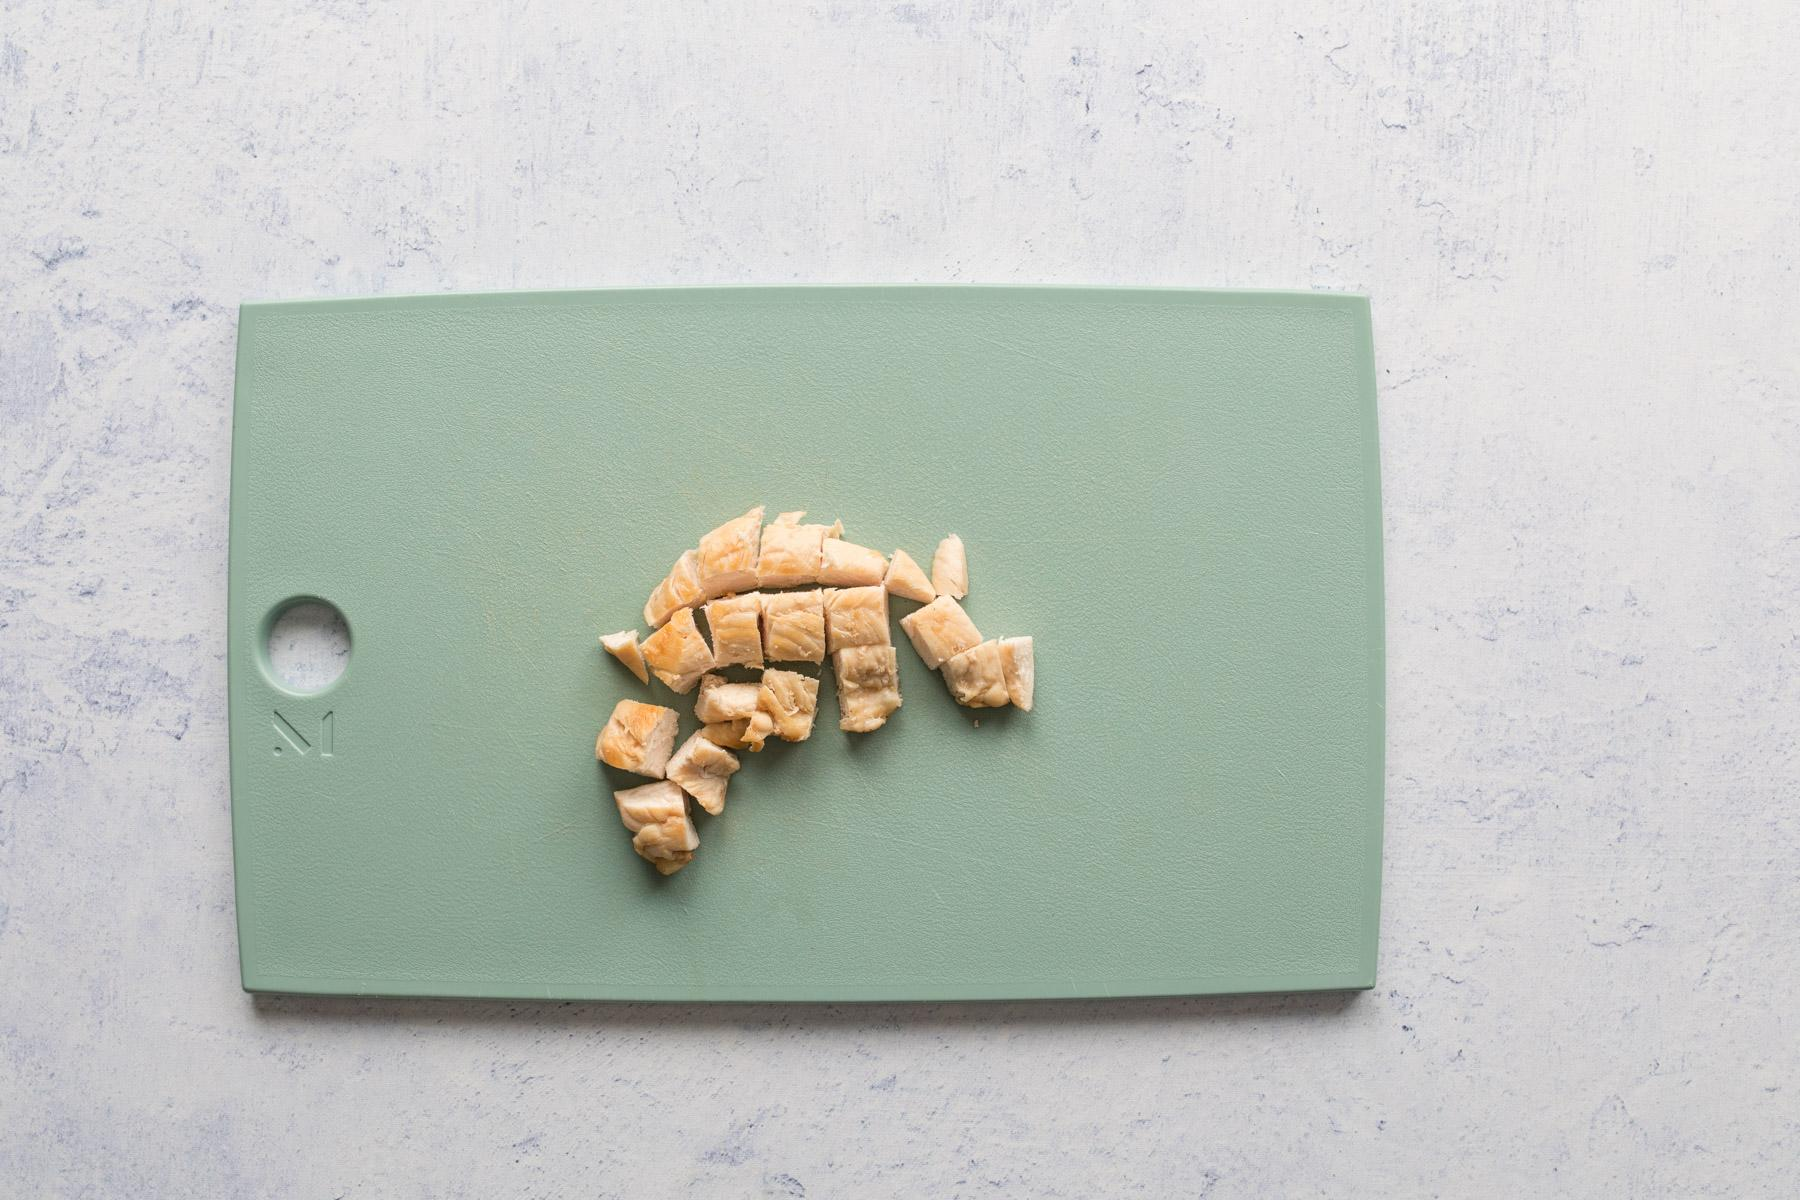 chopped chicken on a green cutting board